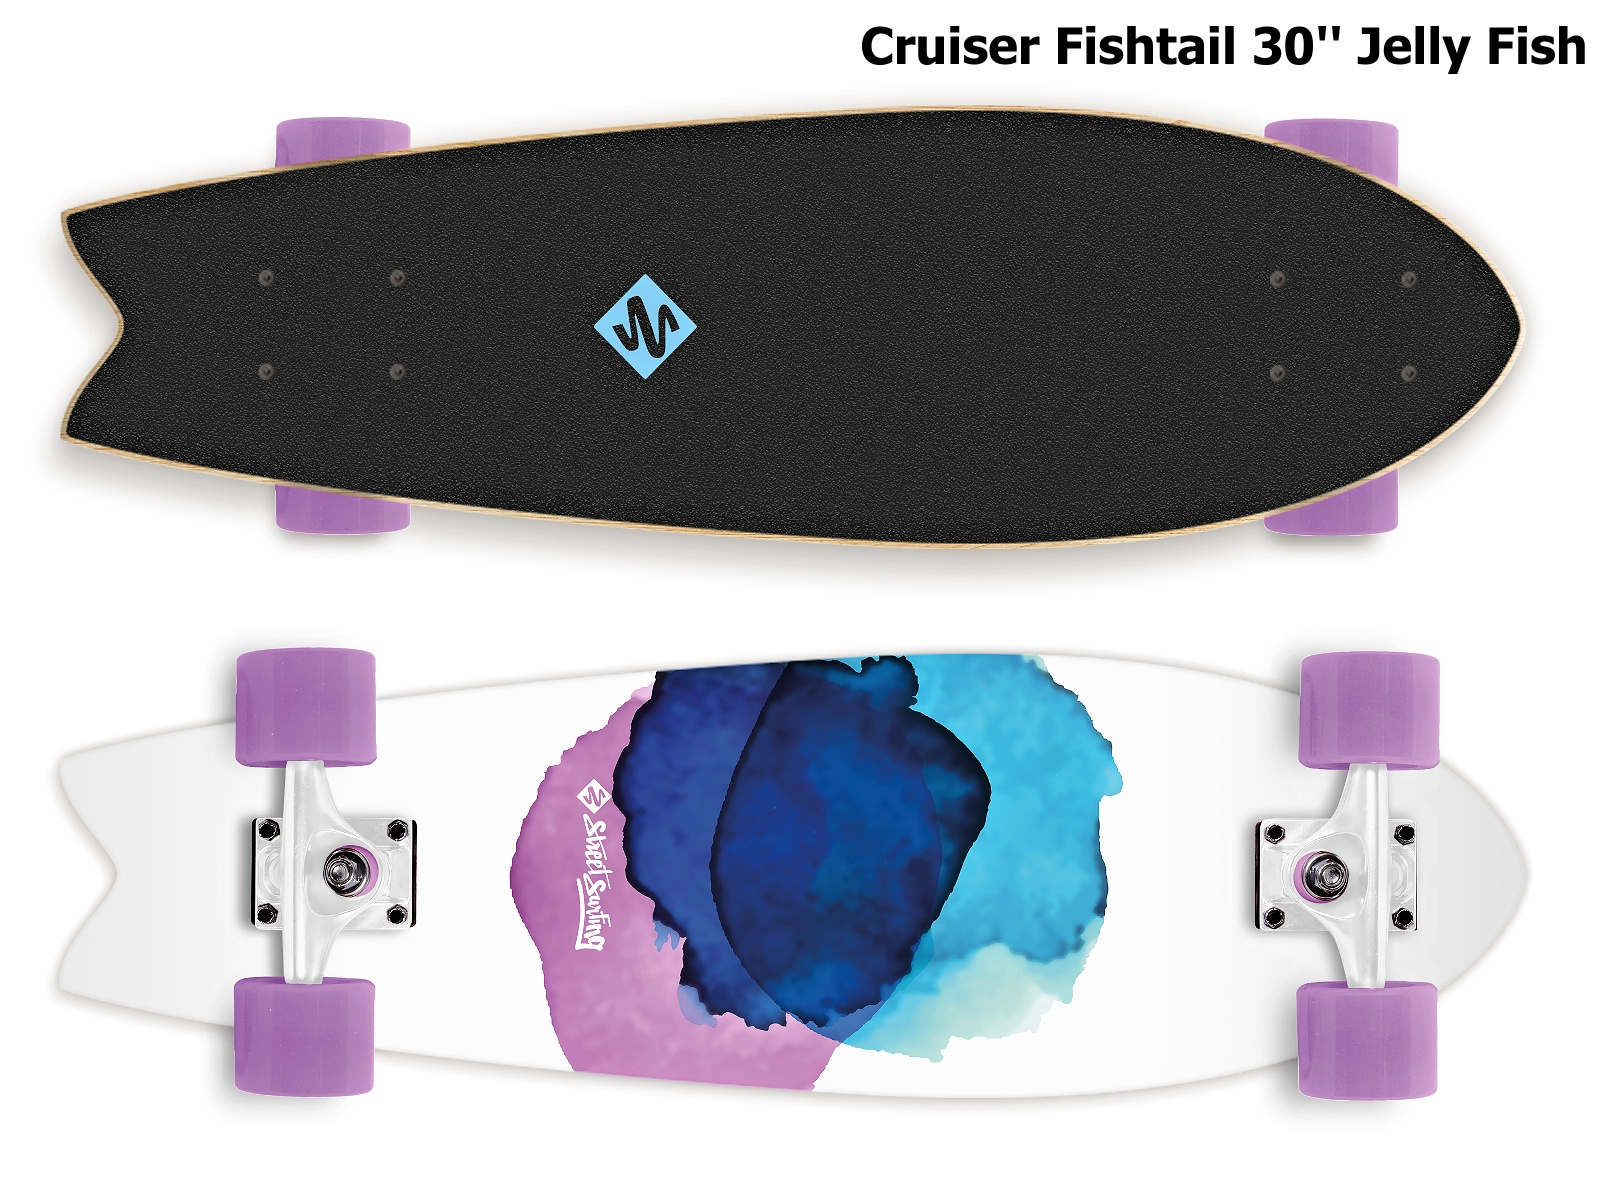 Skateboard STREET SURFING Cruiser Fishtail 30'' Jelly Fish